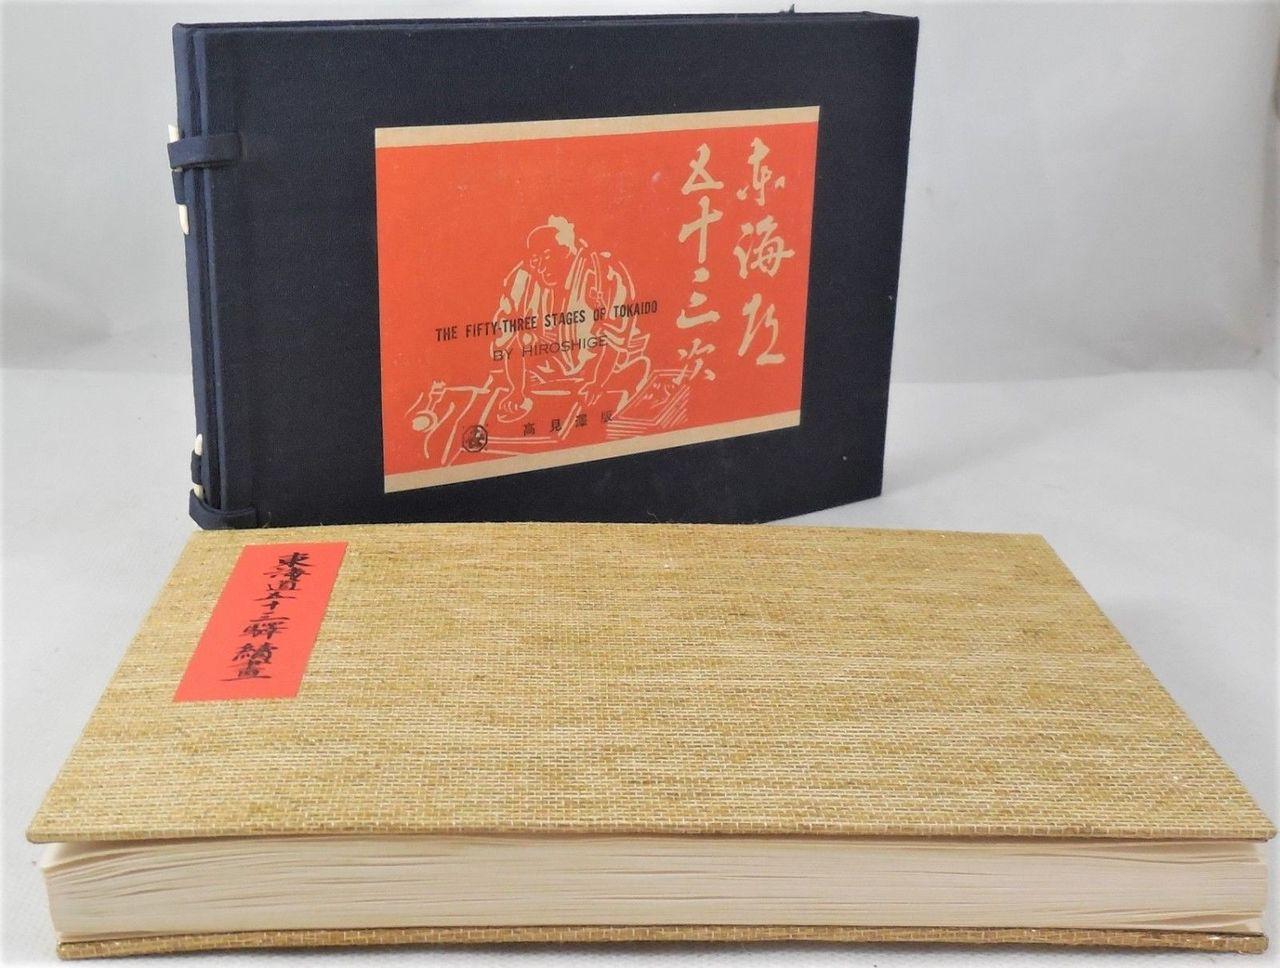 THE FIFTY-THREE STATIONS OF TOKAIDO, by Utagawa Hiroshige - c.1955